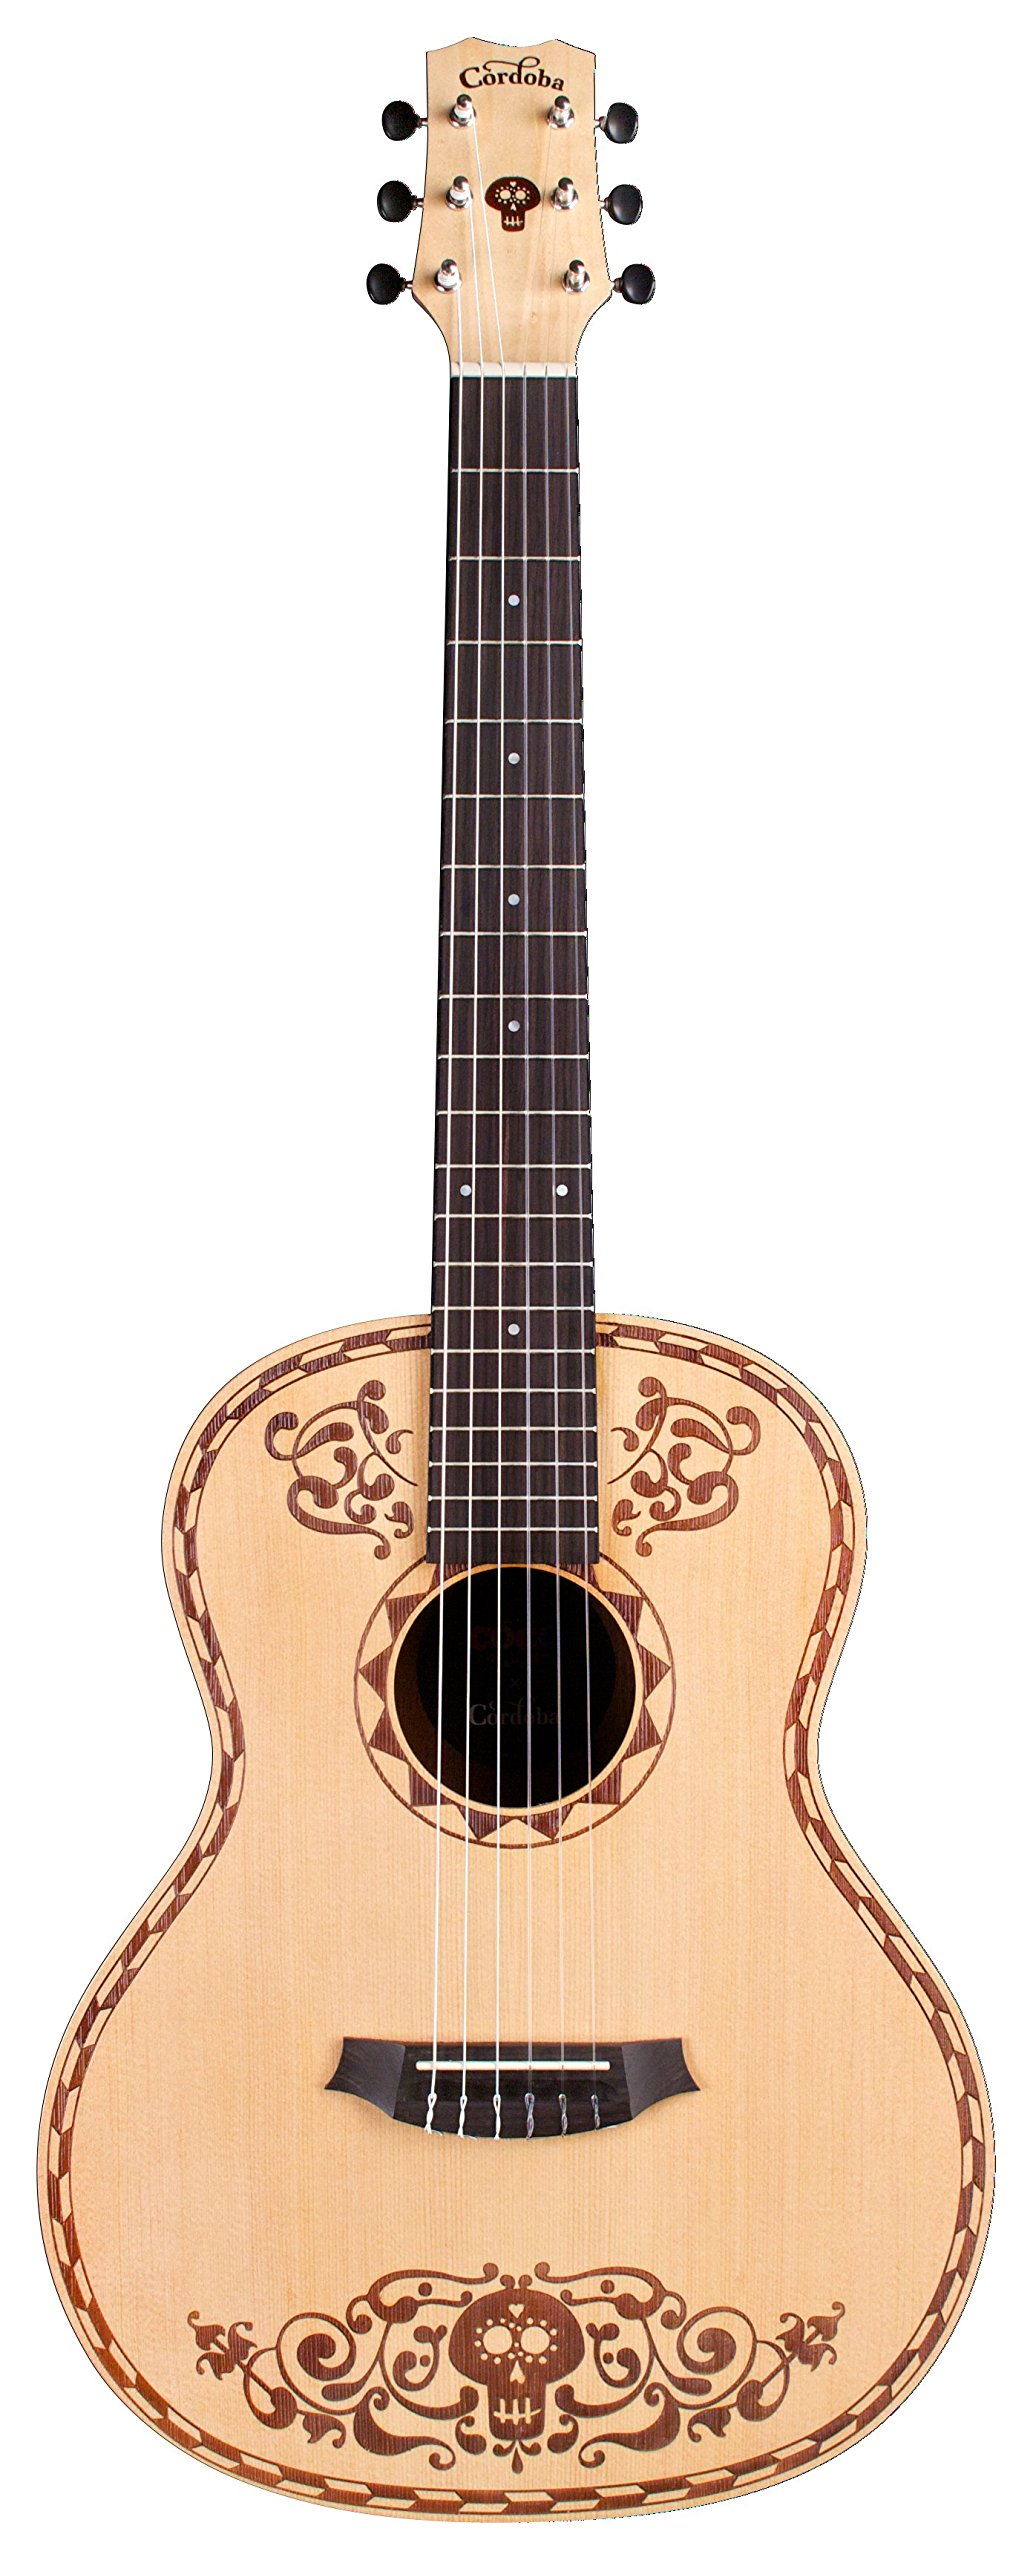 Cordoba Guitars Coco x Cordoba Guitar SP/MH Disney/PixarAcoustic Guitar